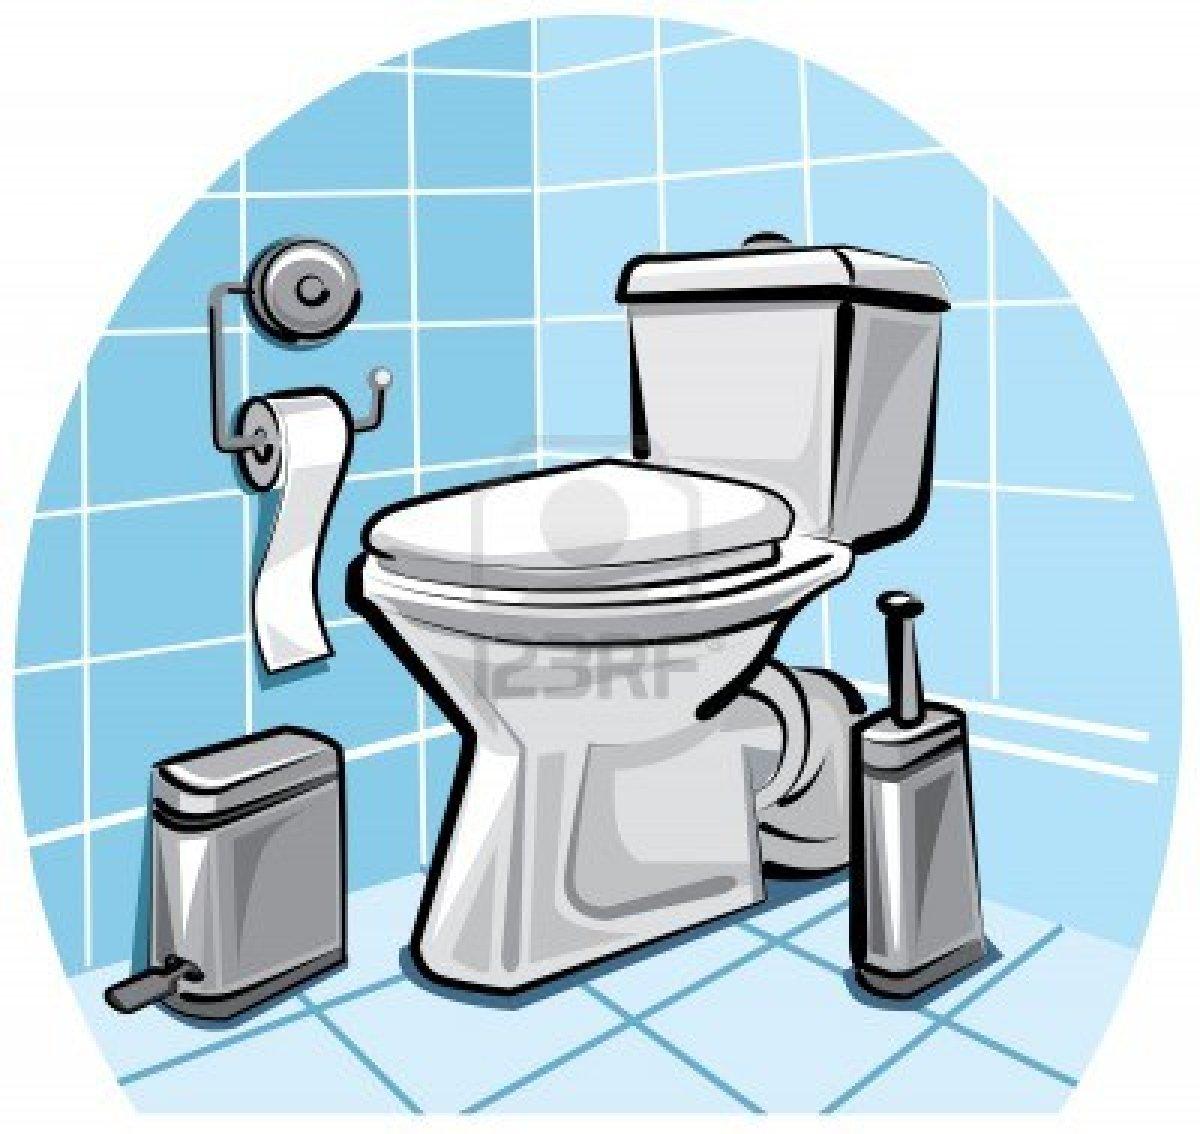 Bathroom clipart comfort room. School station